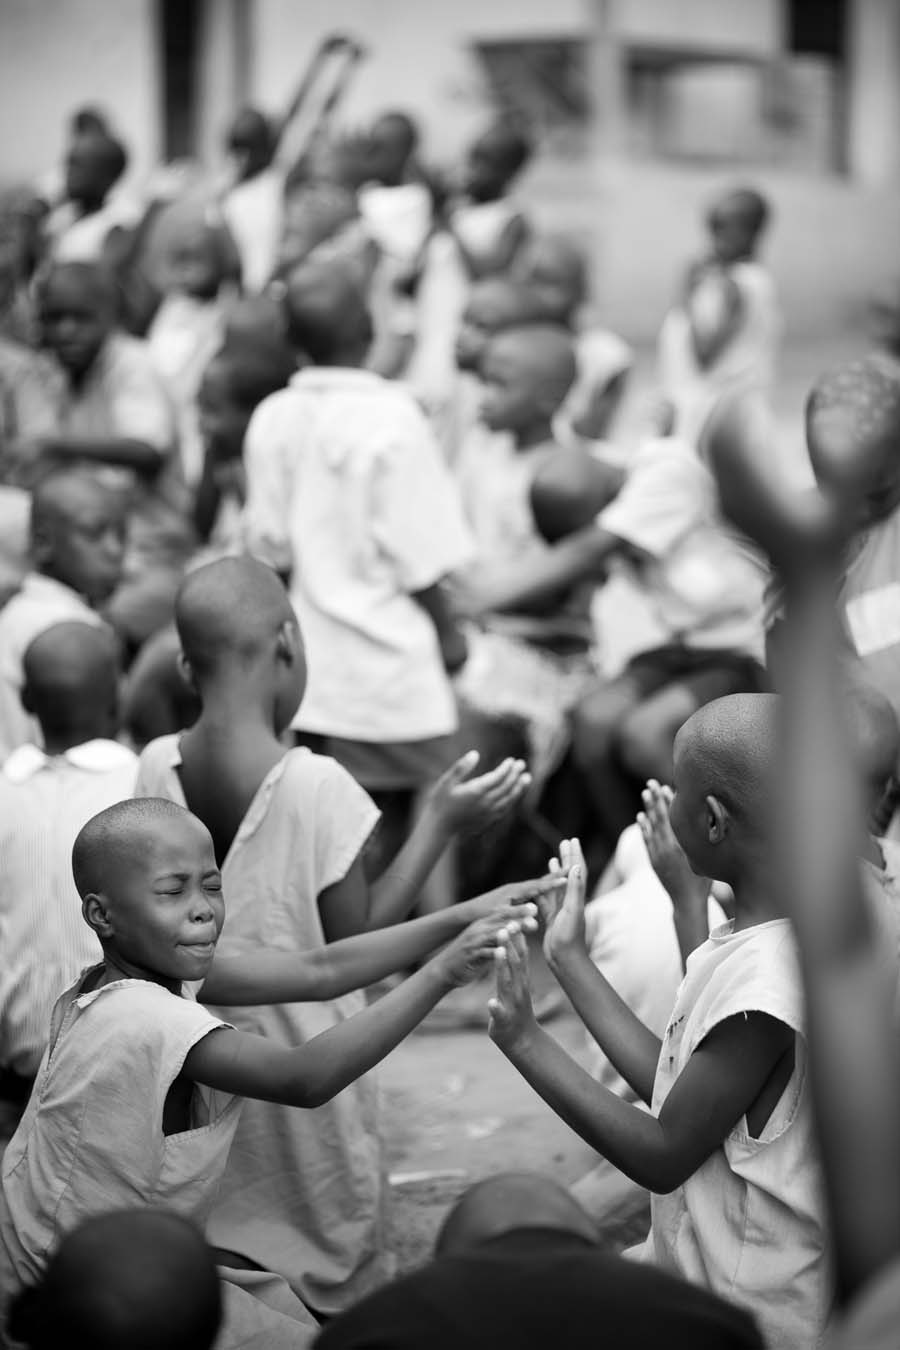 jessicadavisphotography.com | Jessica Davis Photography | Portrait Work in Uganda| Travel Photographer | World Event Photographs 2 (7).jpg